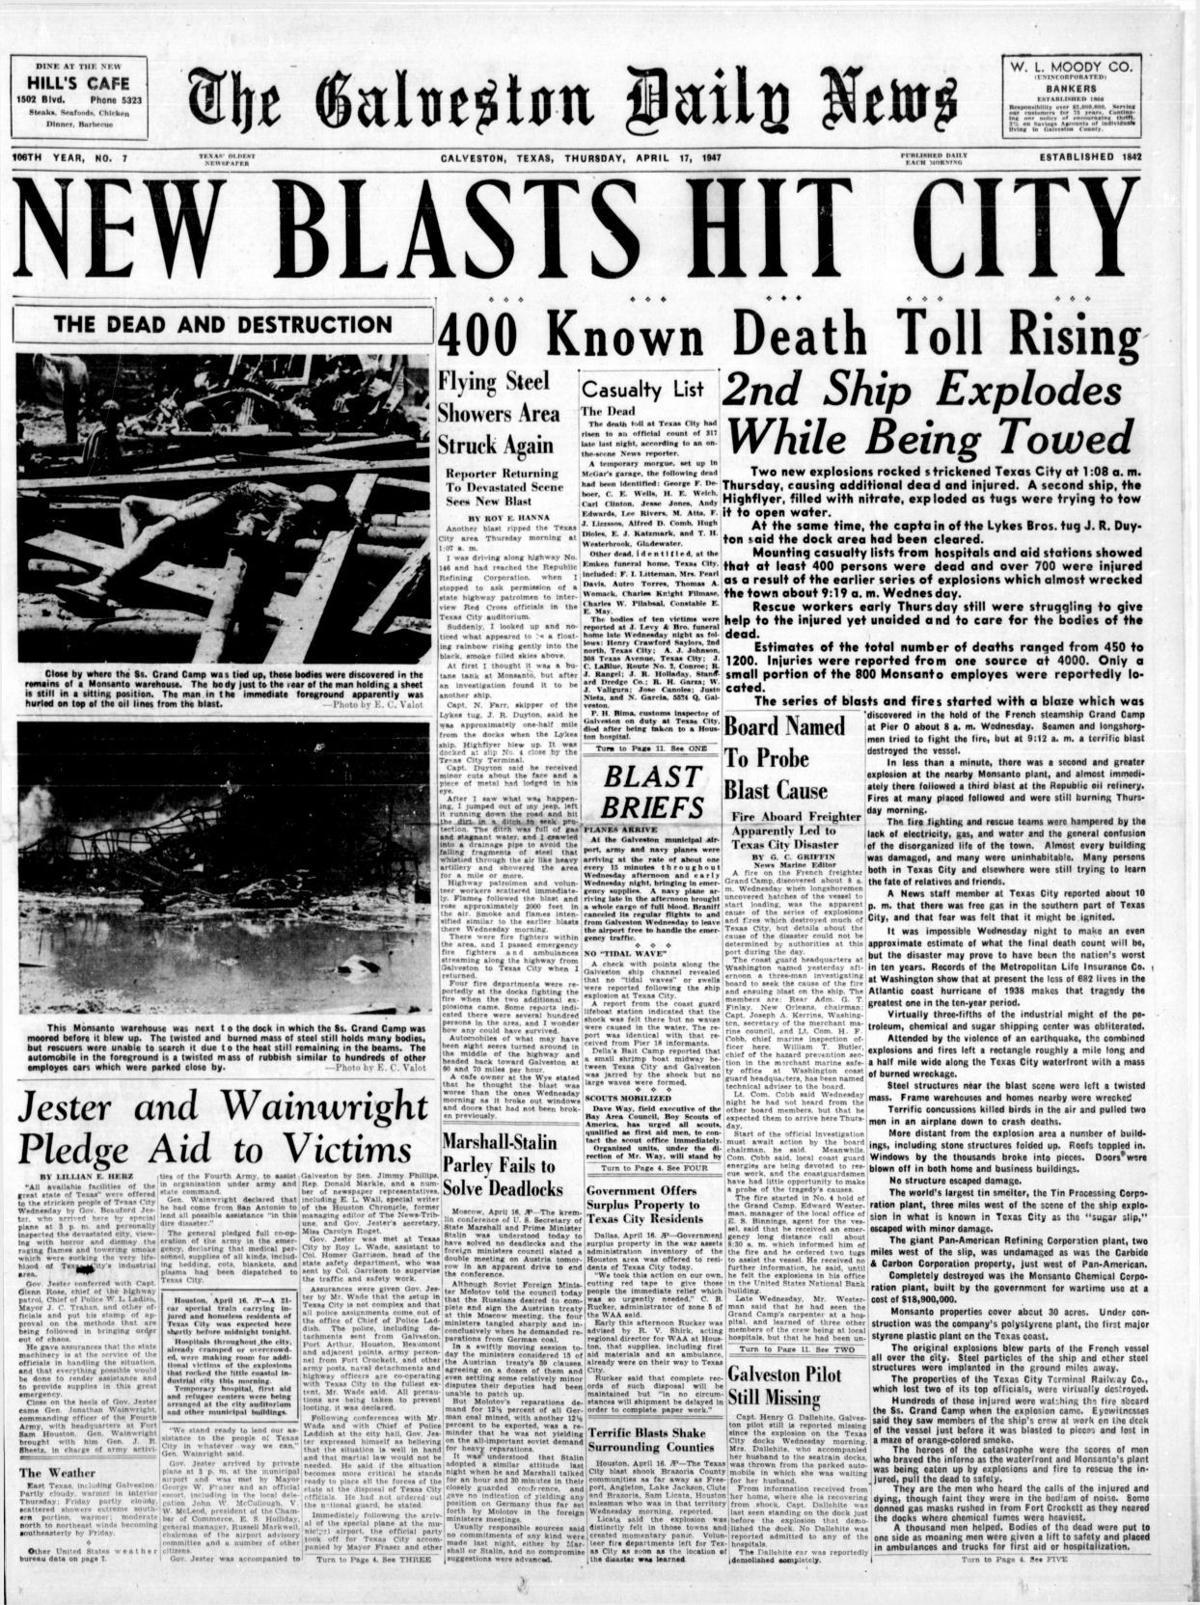 April 17, 1947